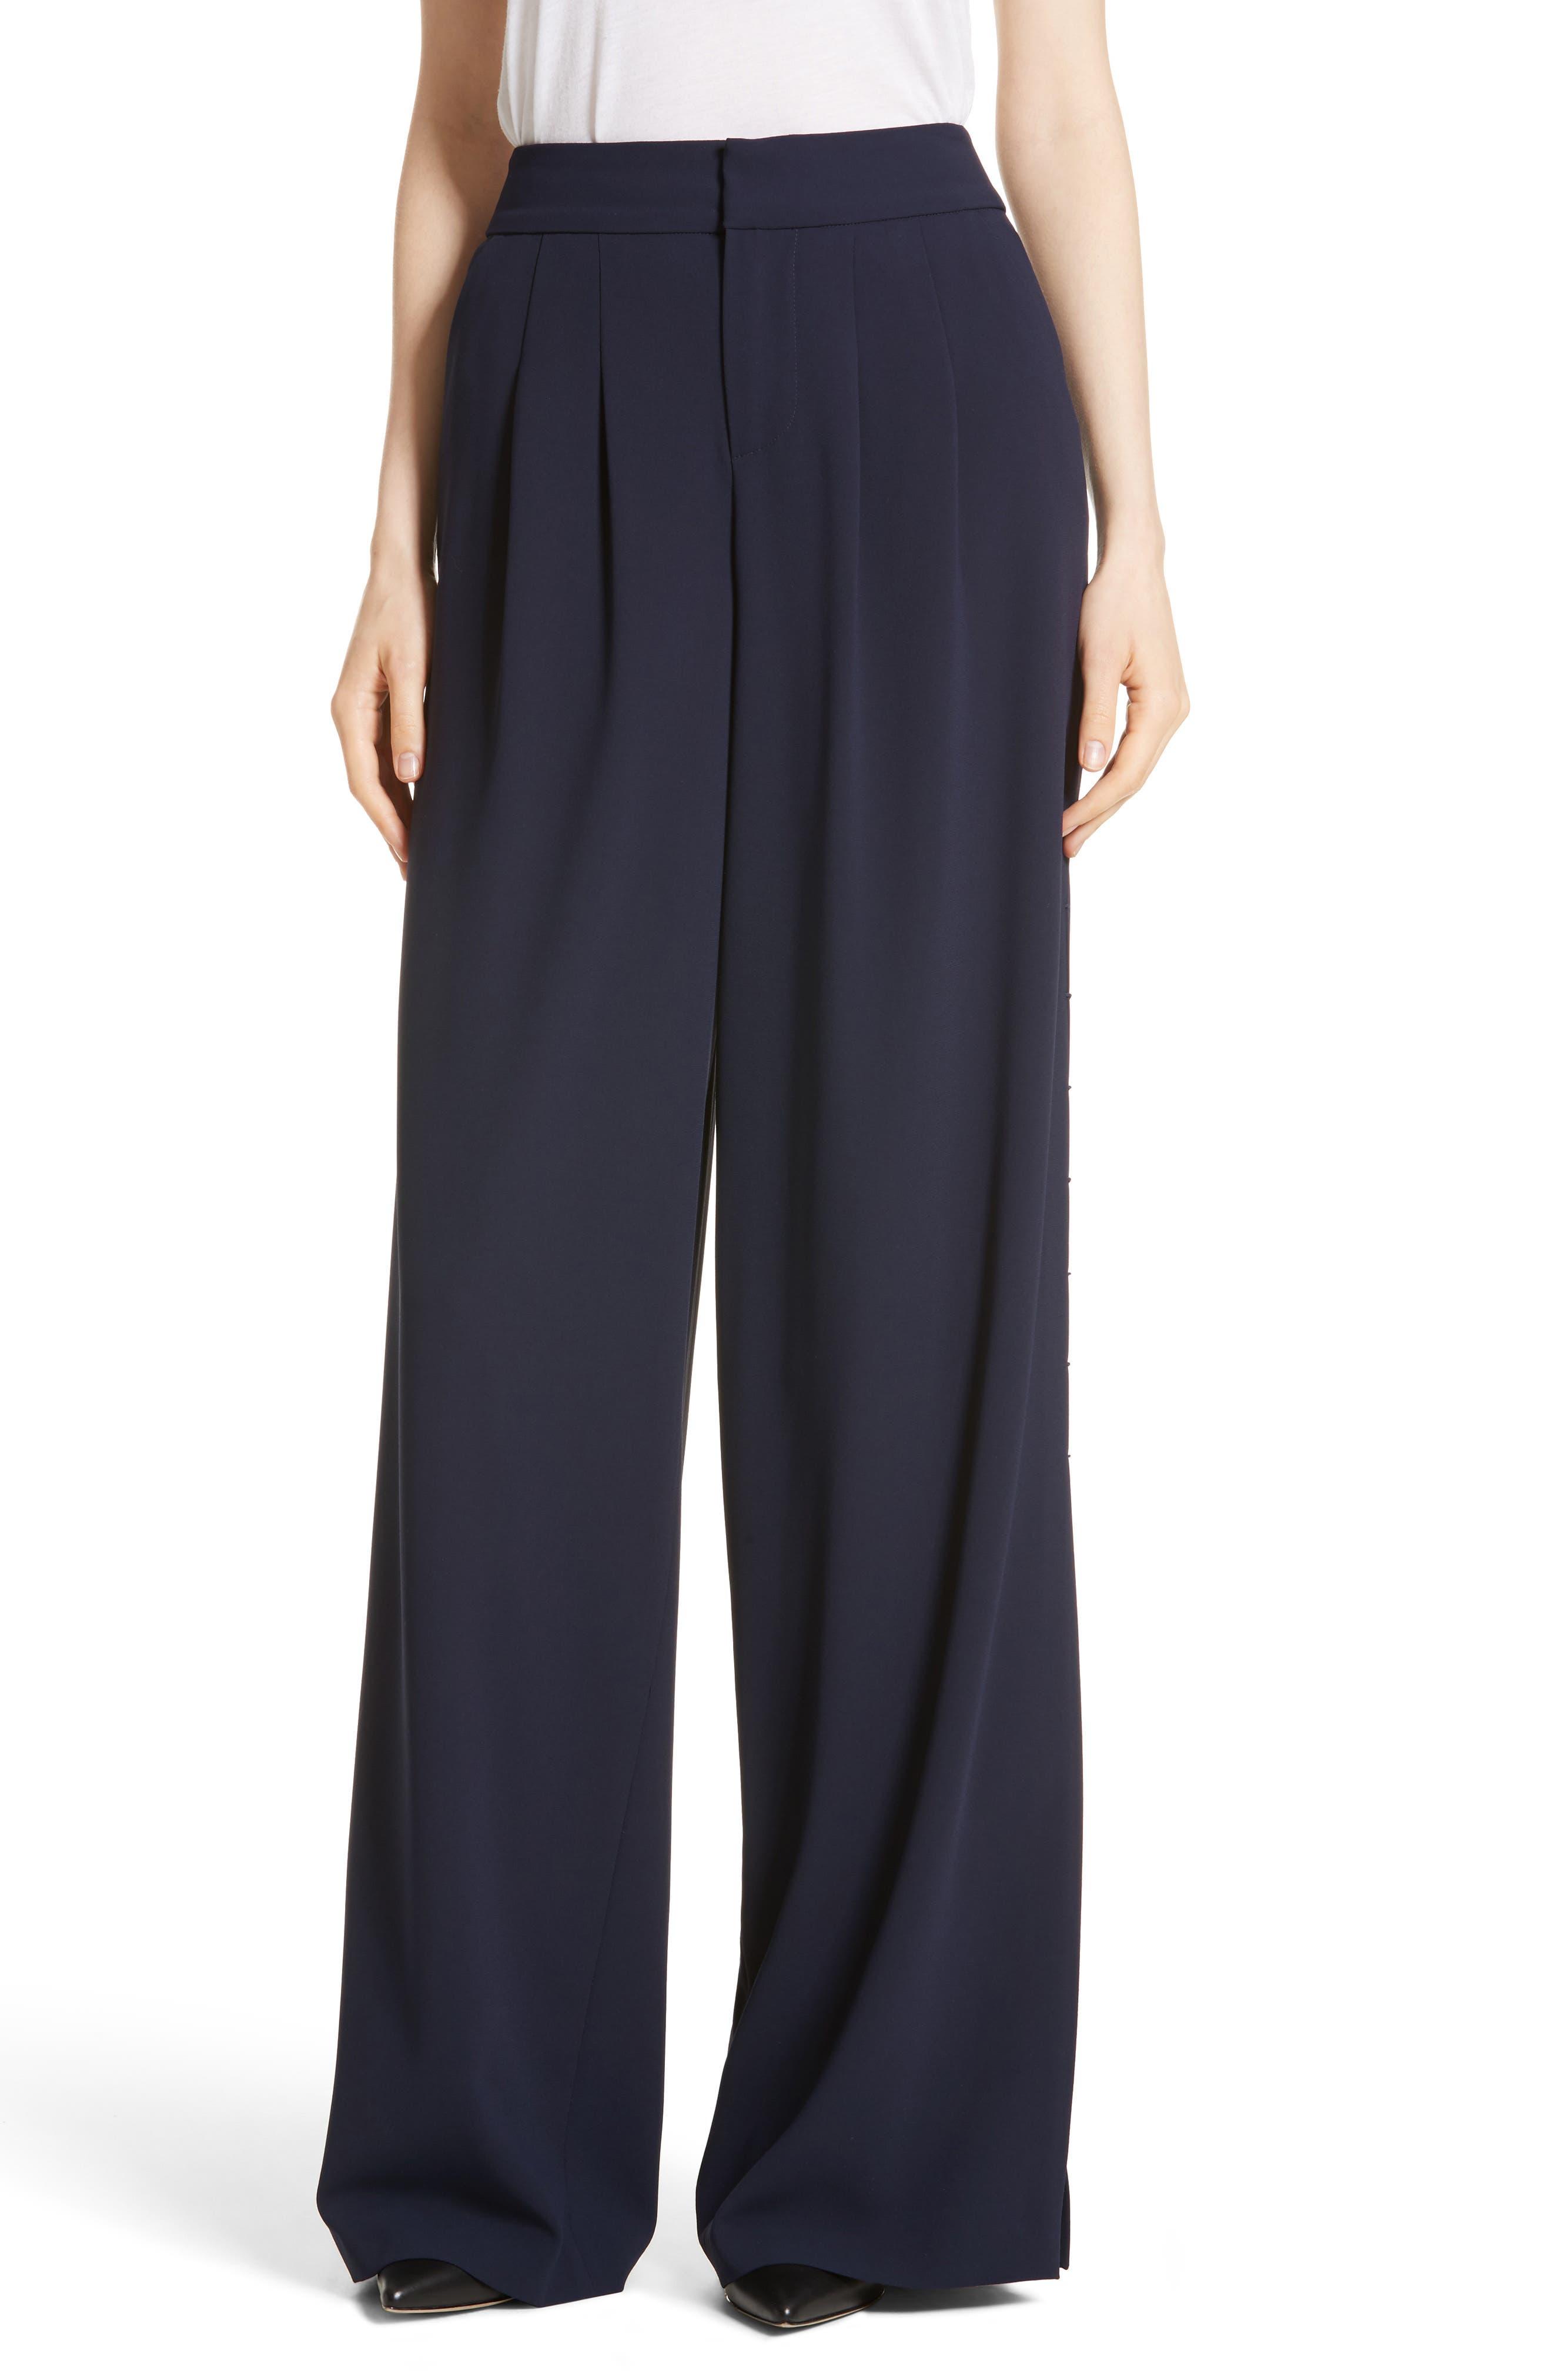 Shavon High Waist Side Slit Flare Pants,                         Main,                         color, 400